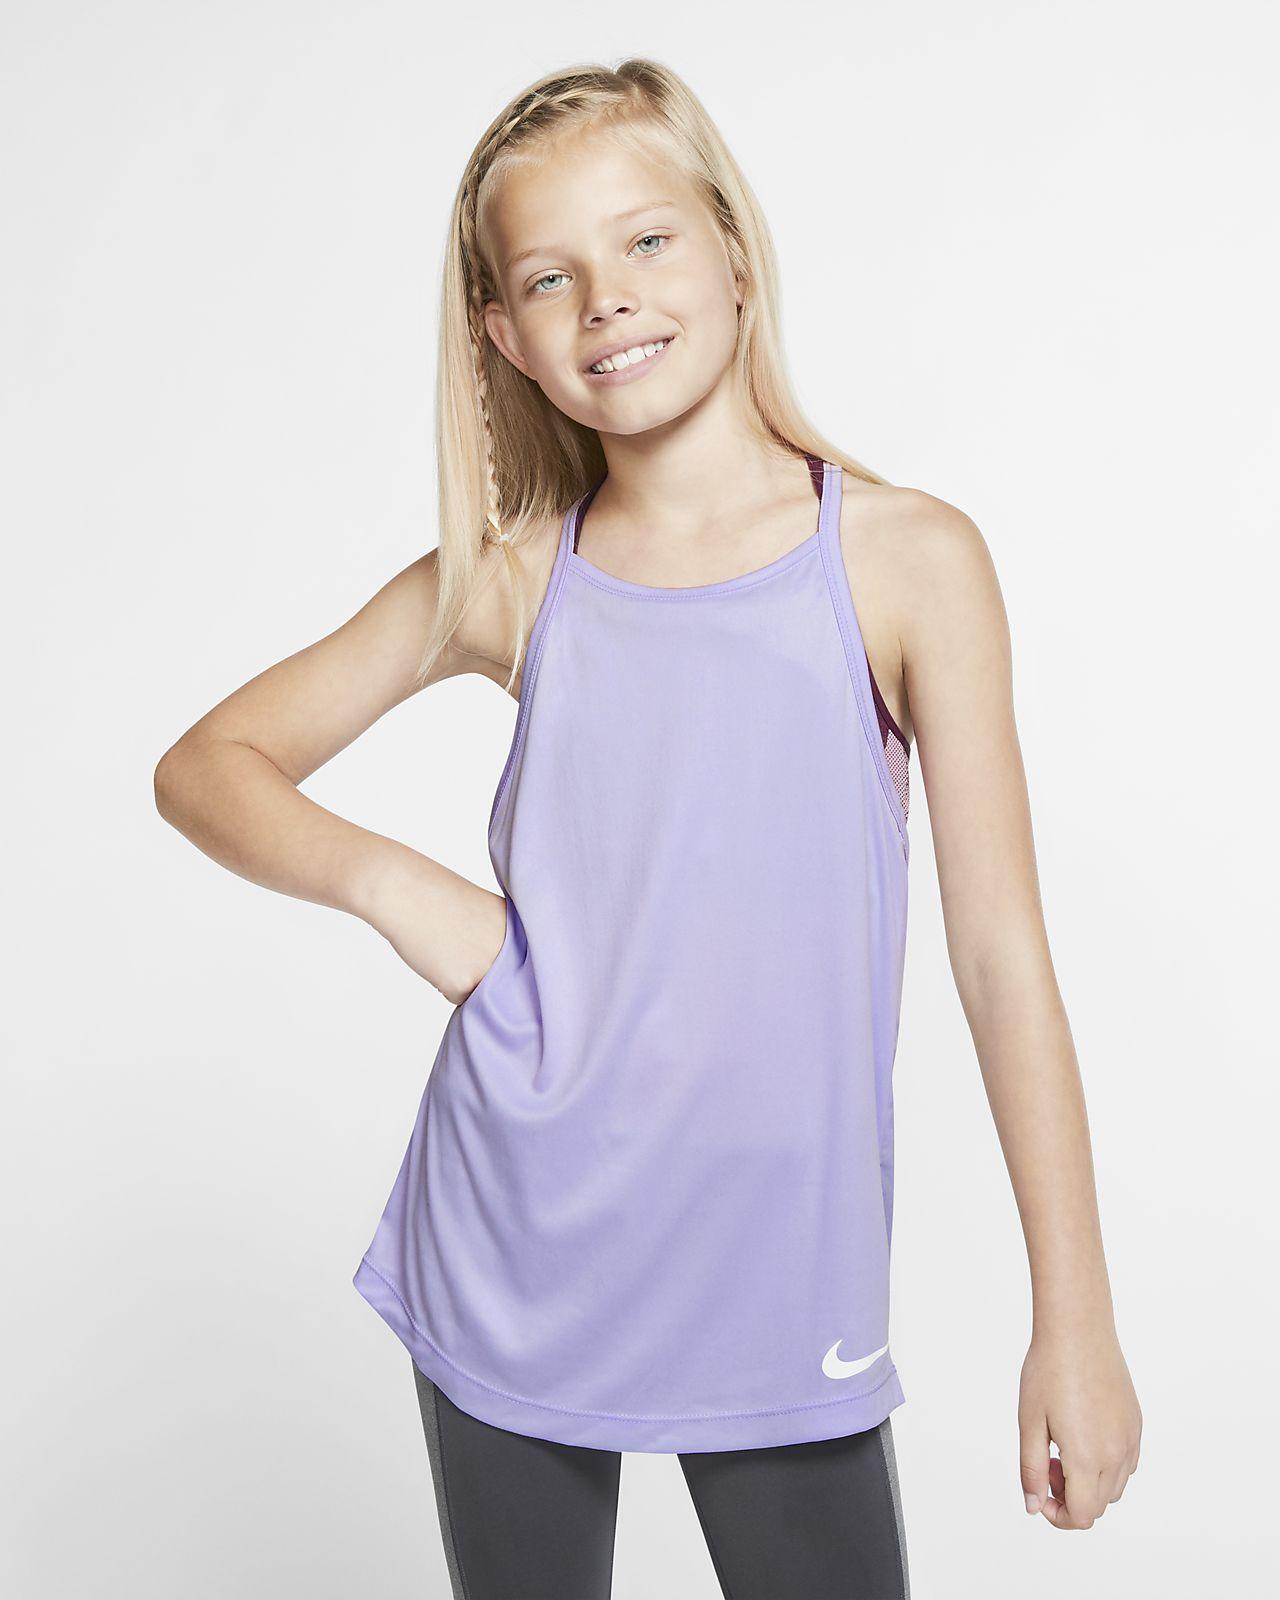 Canotta da training Nike Dri-FIT - Ragazza